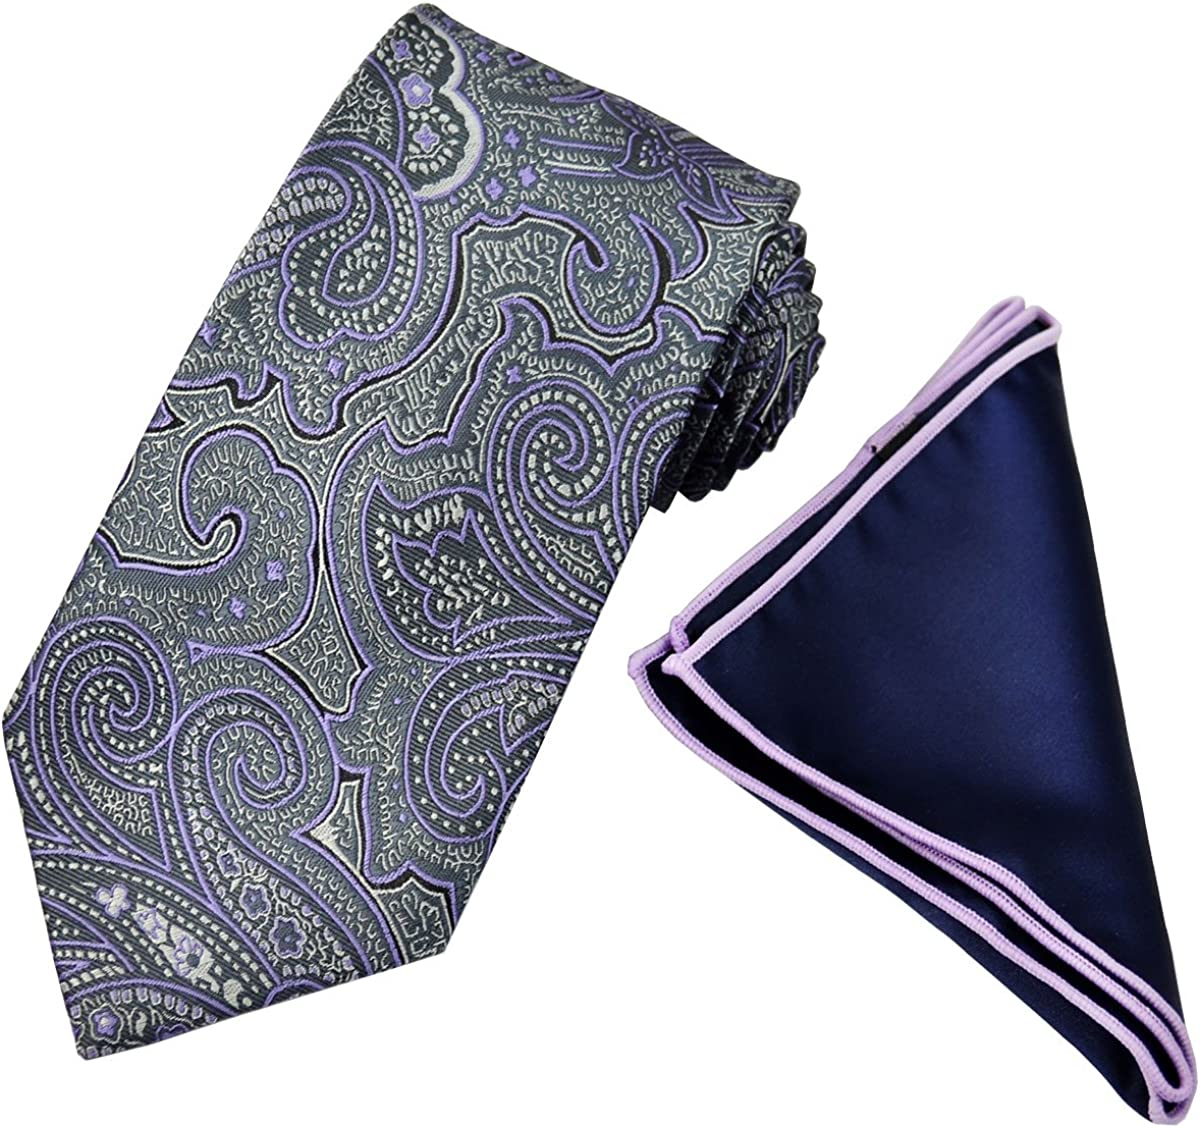 Purple Paisley Tie with Contrast Pocket Square Set